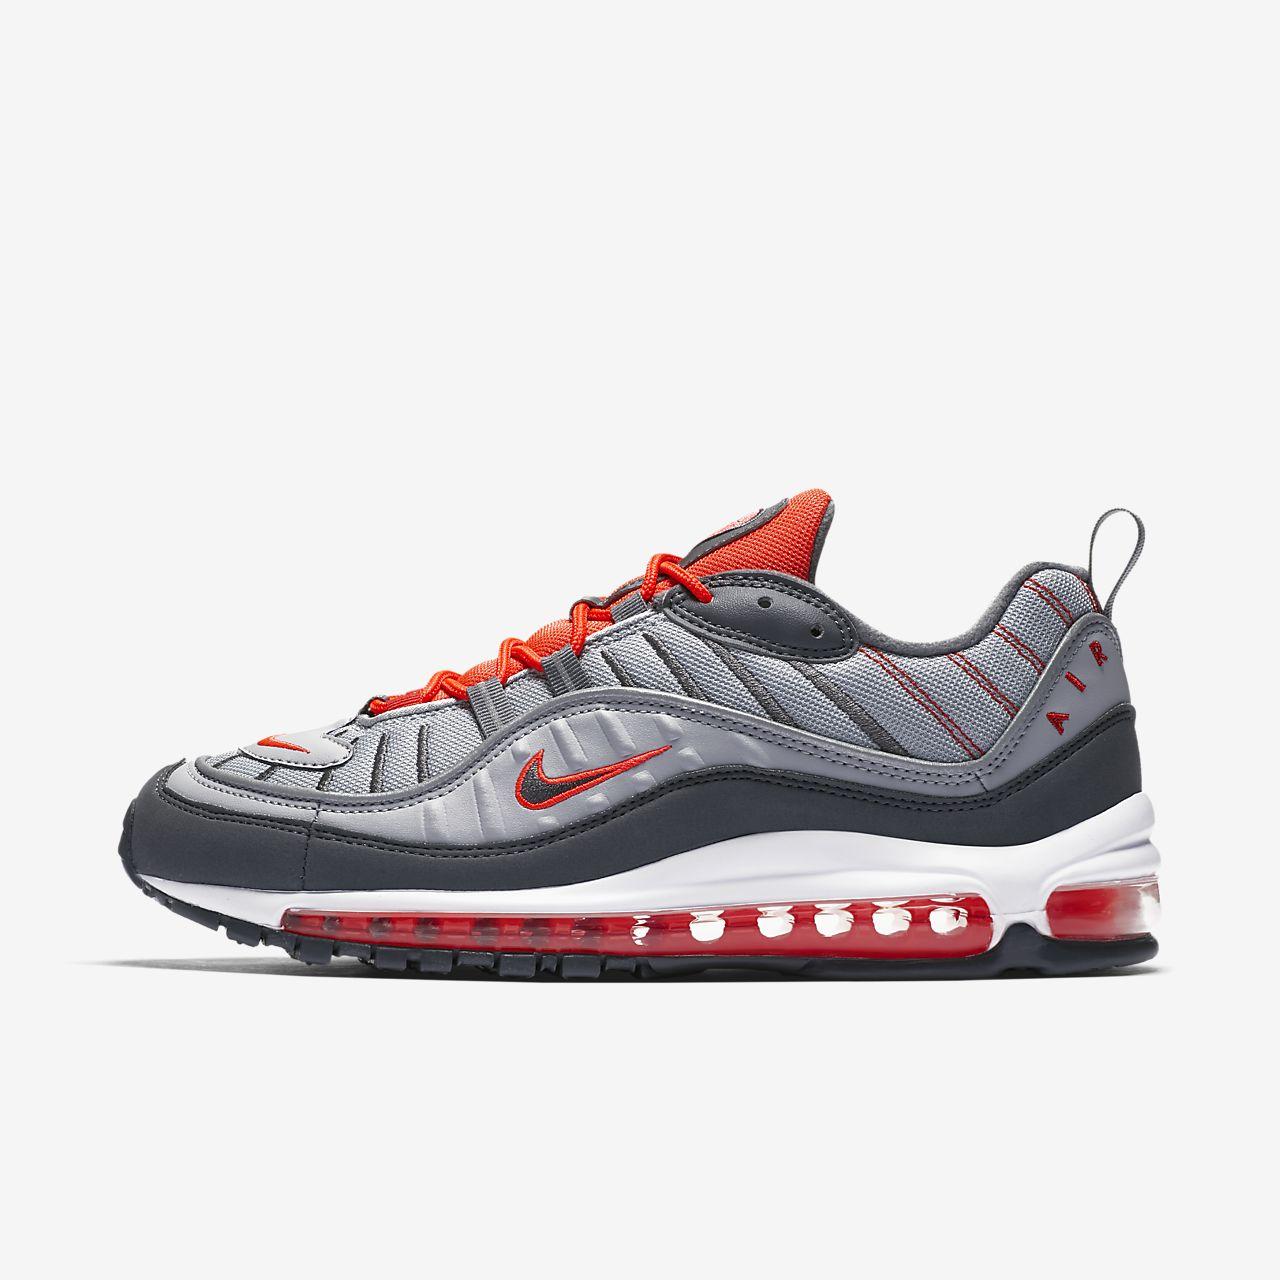 Nike Air Max 98 Zapatillas de correr